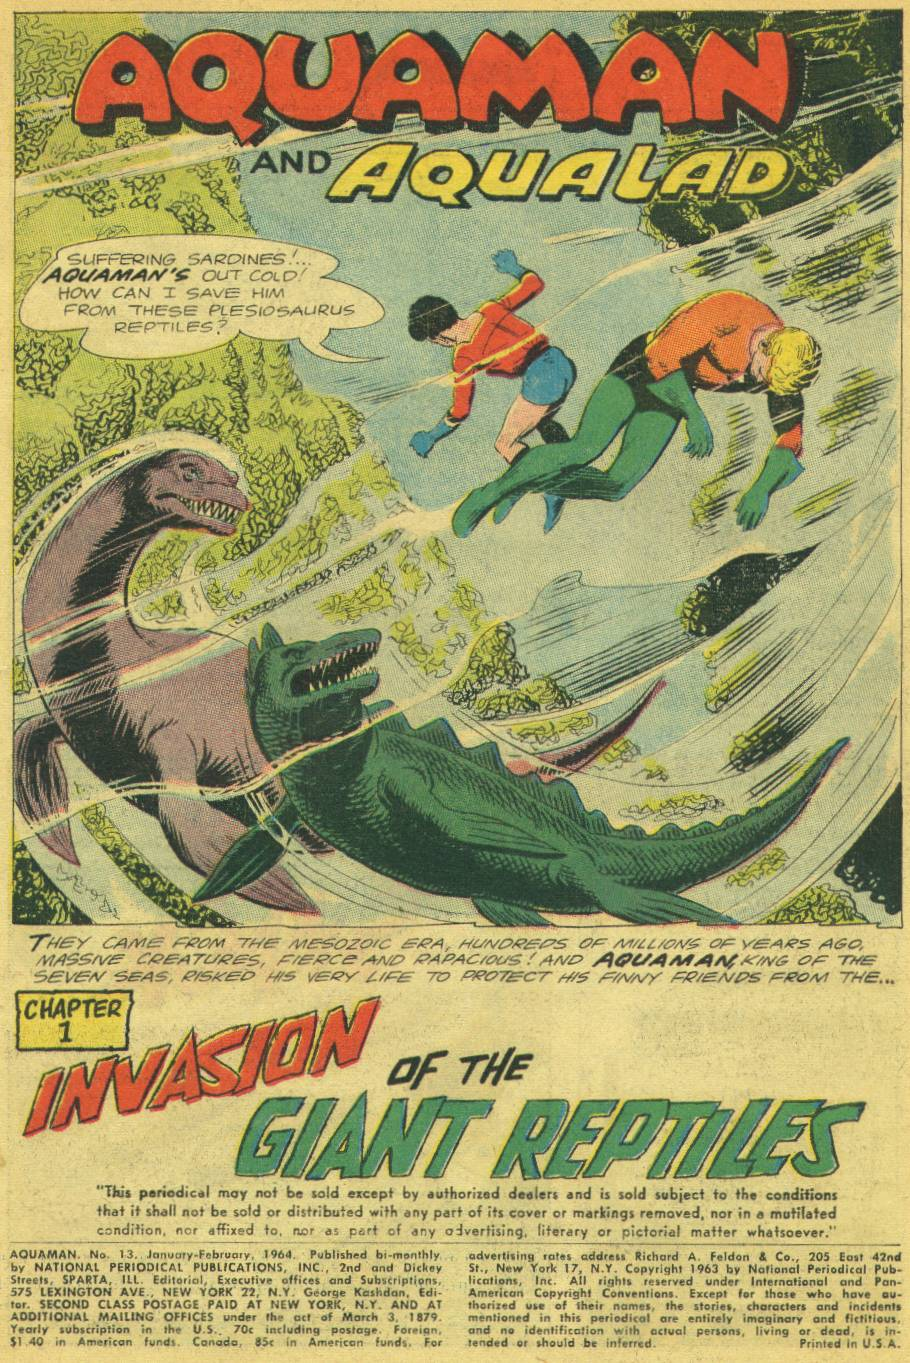 Read online Aquaman (1962) comic -  Issue #13 - 3